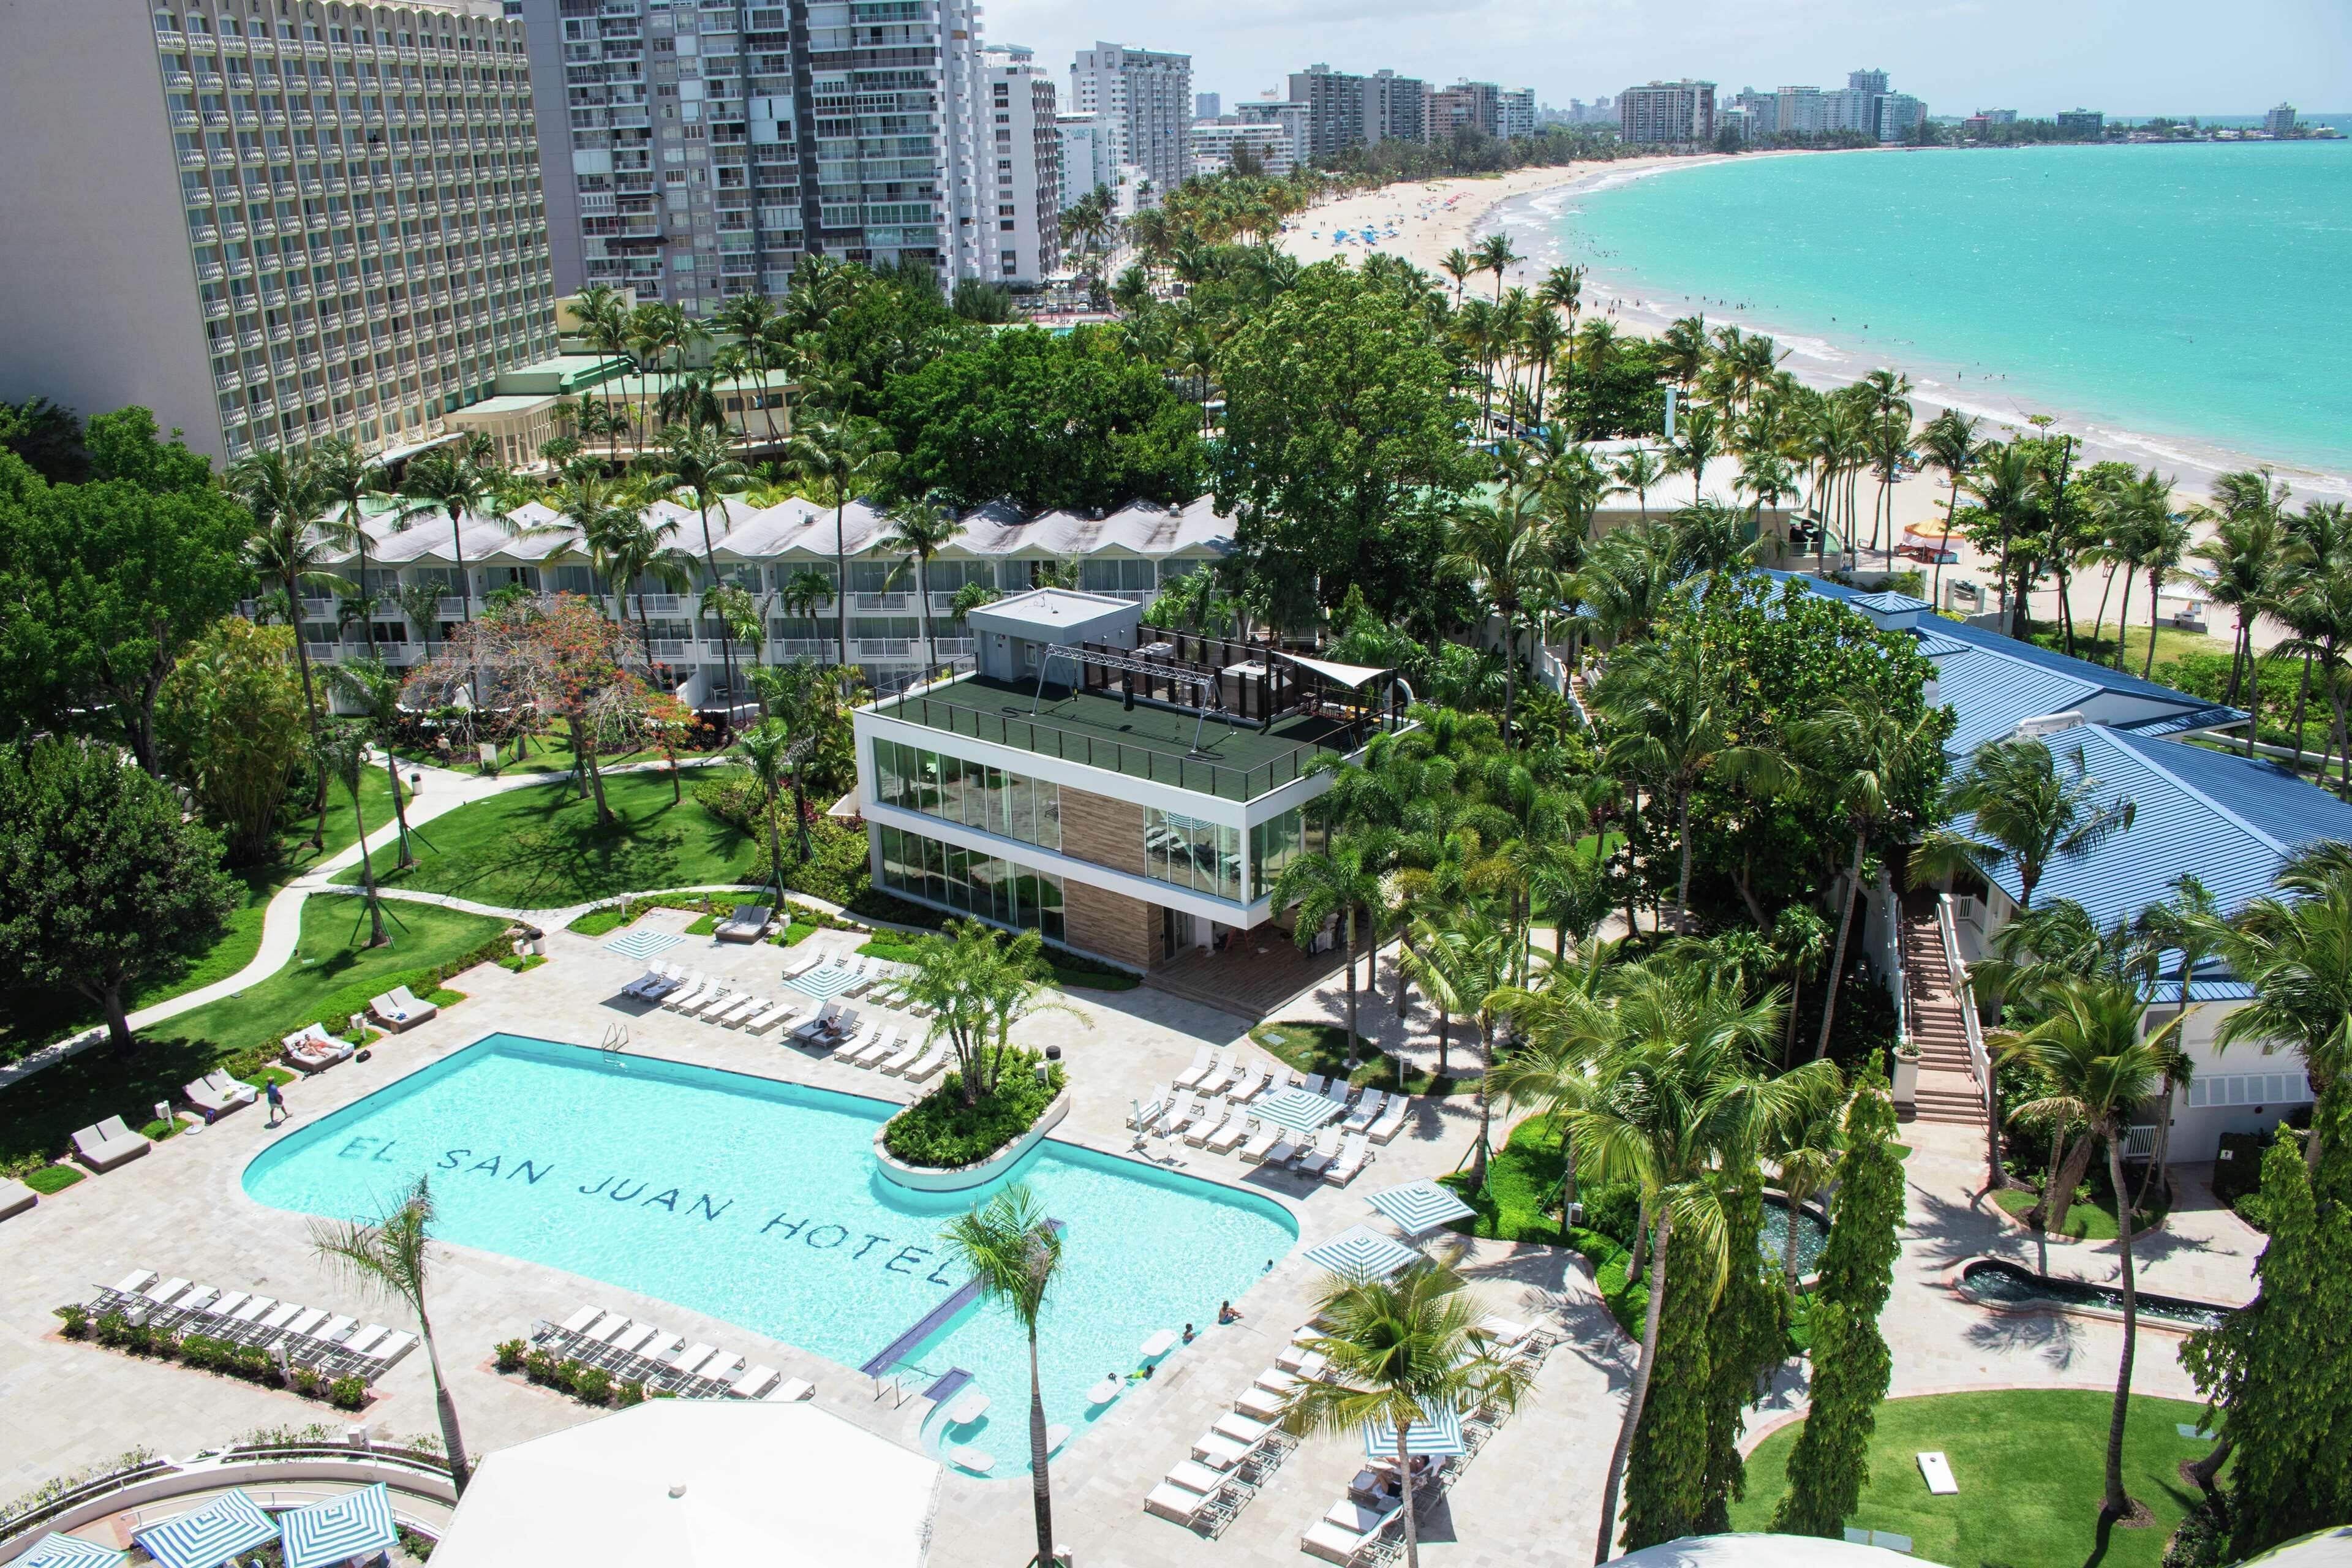 Courtesy of Fairmont El San Juan Hotel / Expedia